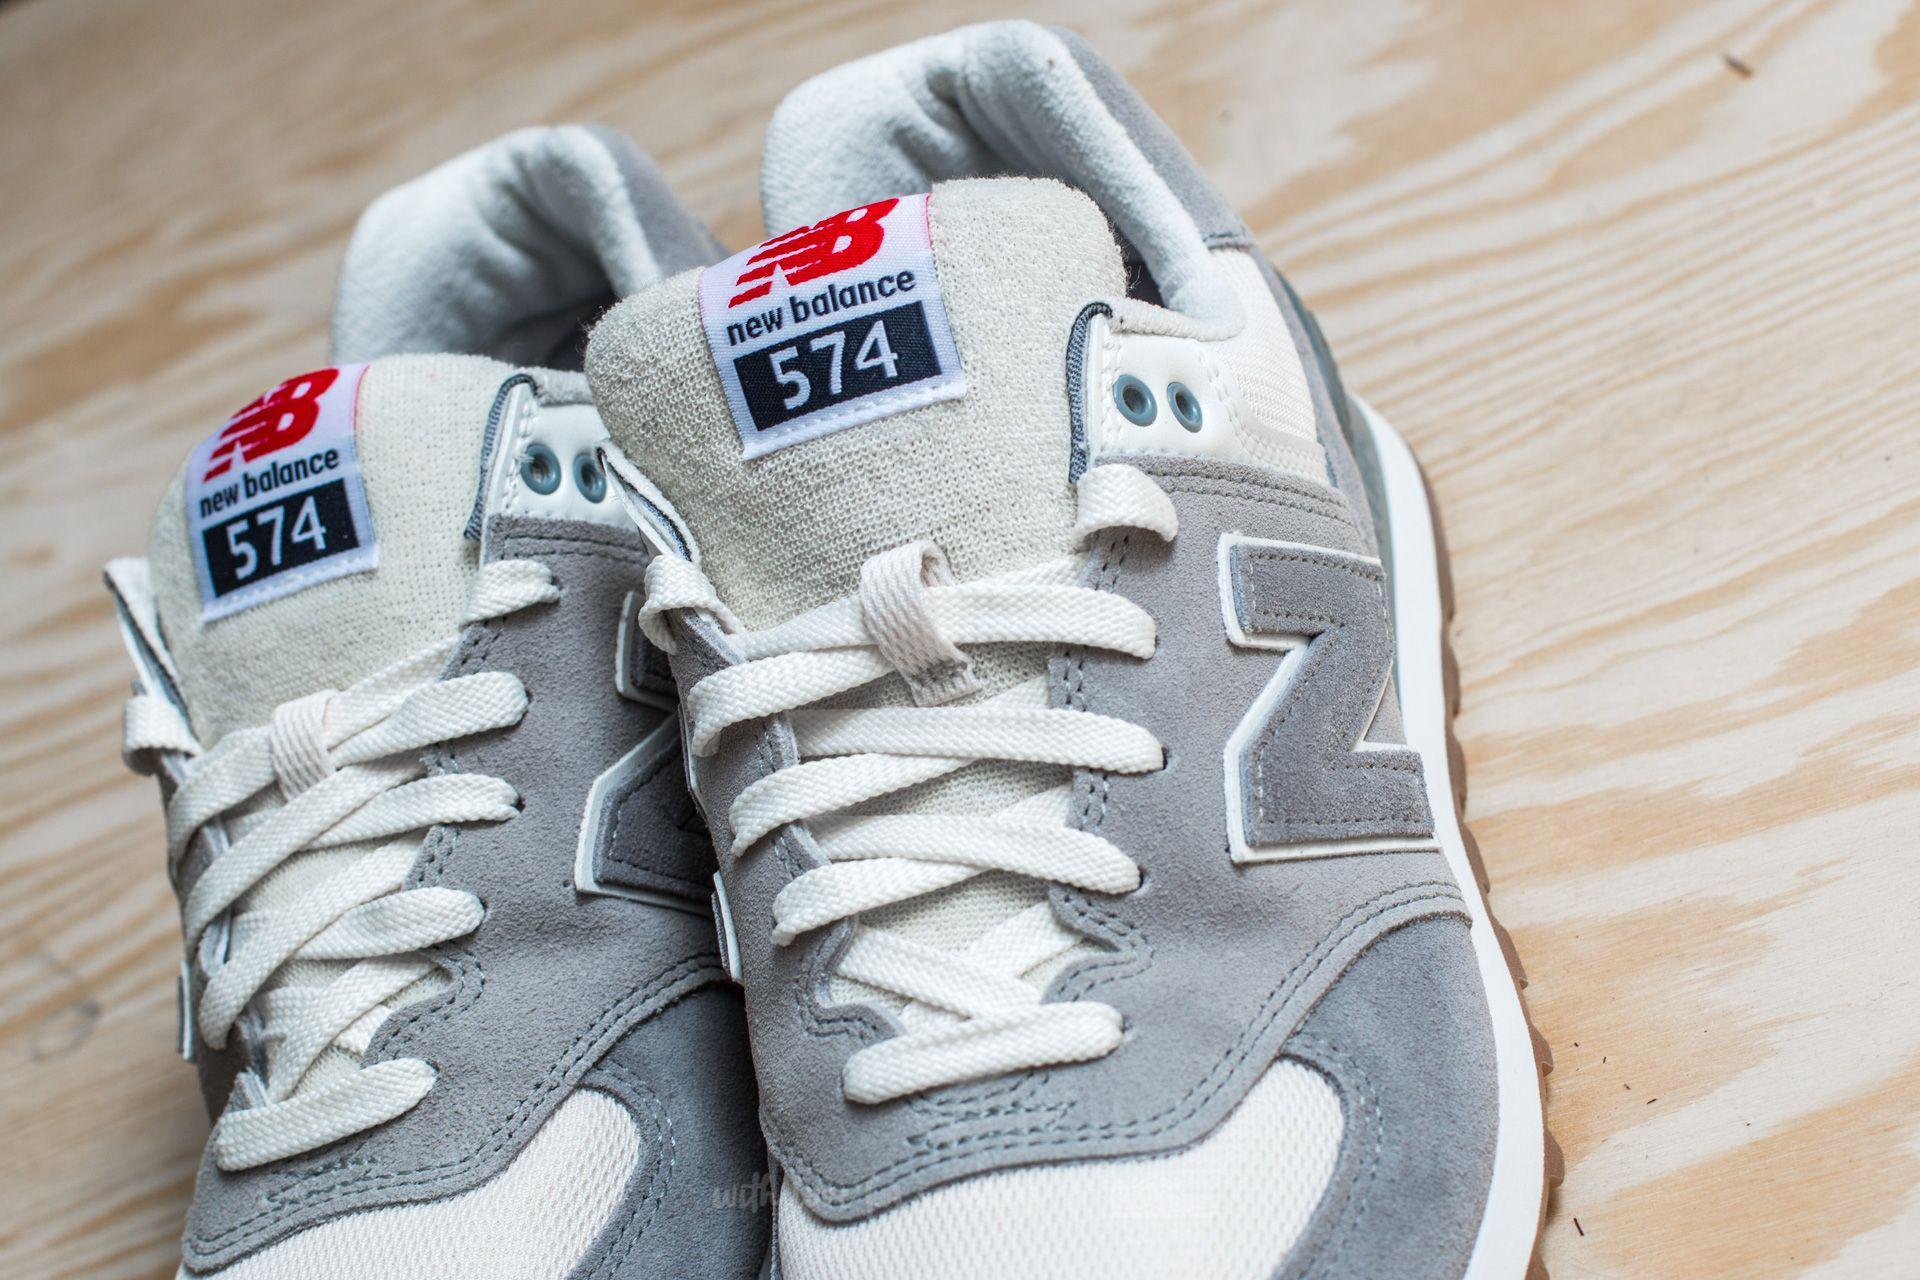 New Balance 574 Men's Running Shoes SteelSilver Mink